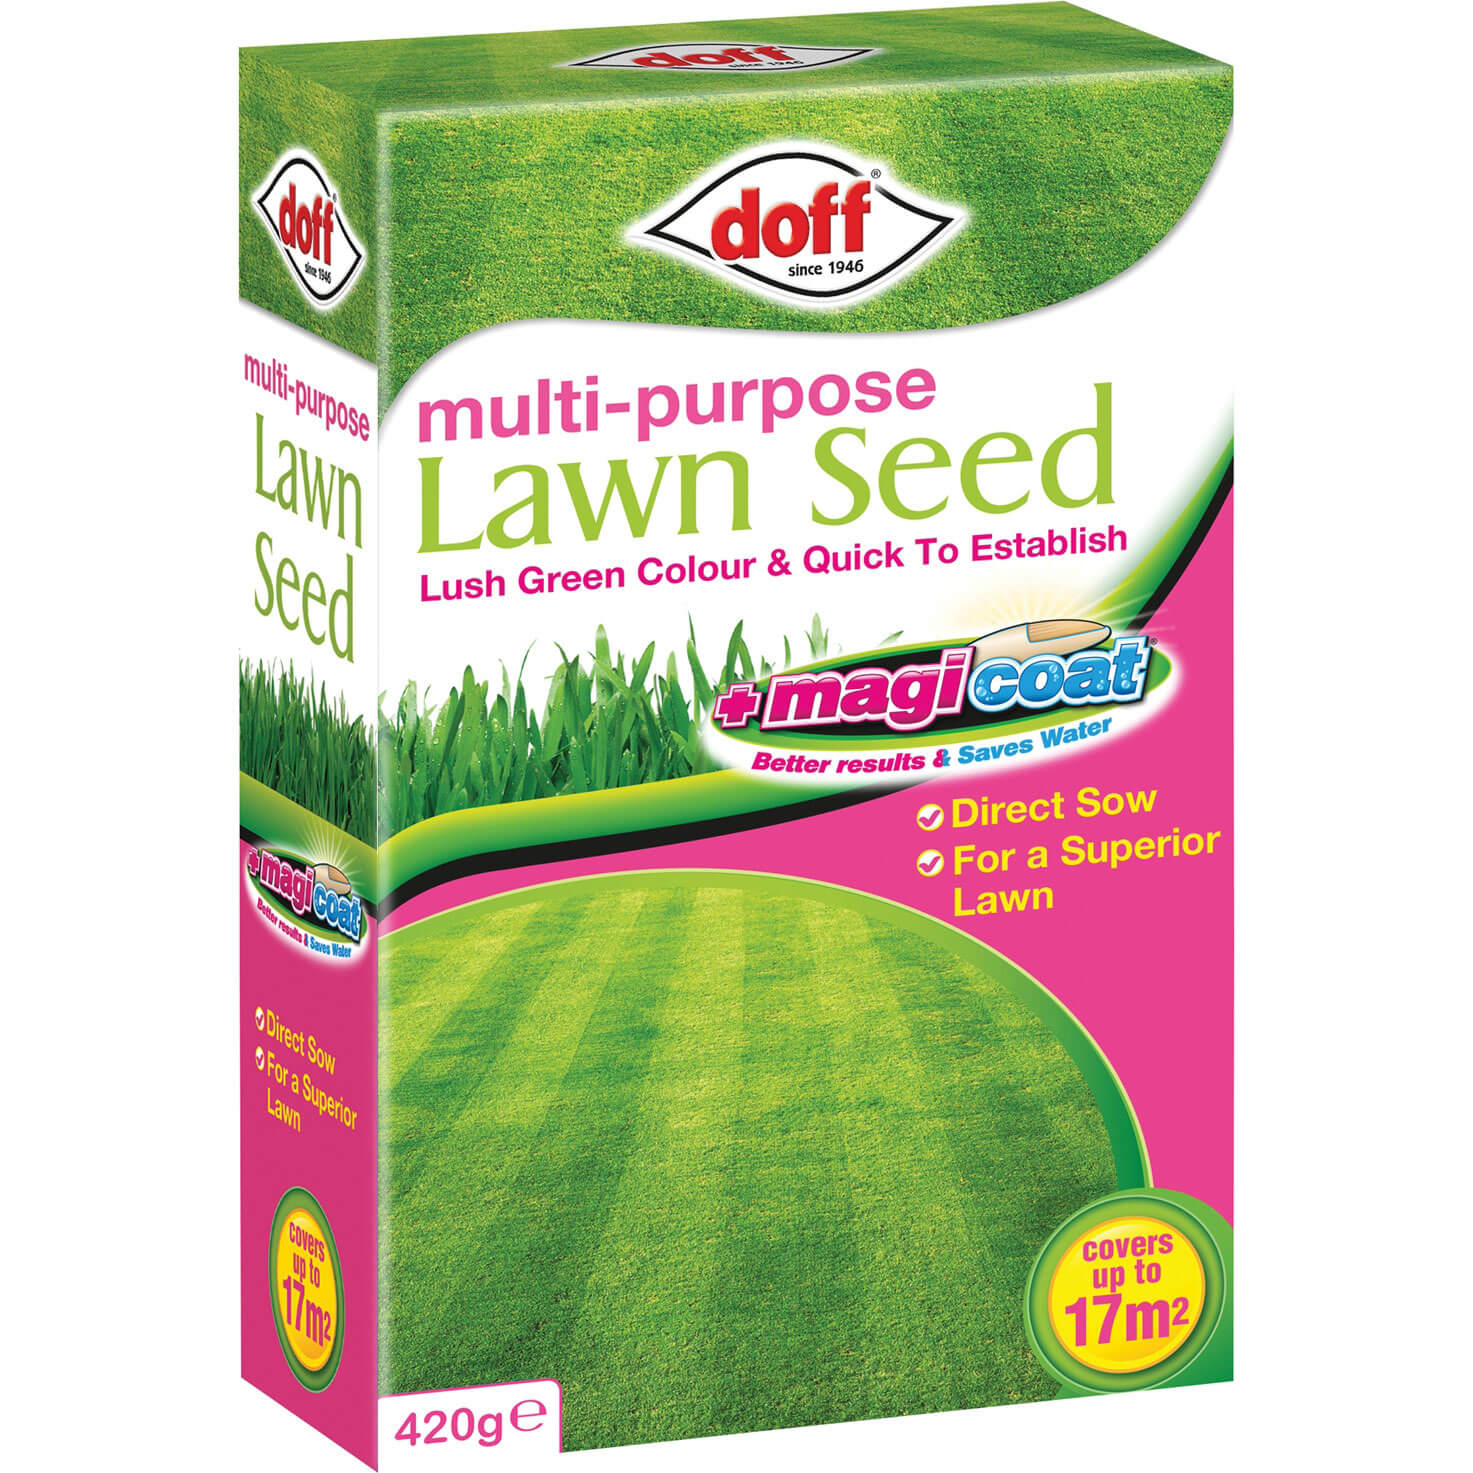 Doff Multi Purpose Magicoat Lawn Seed 420g